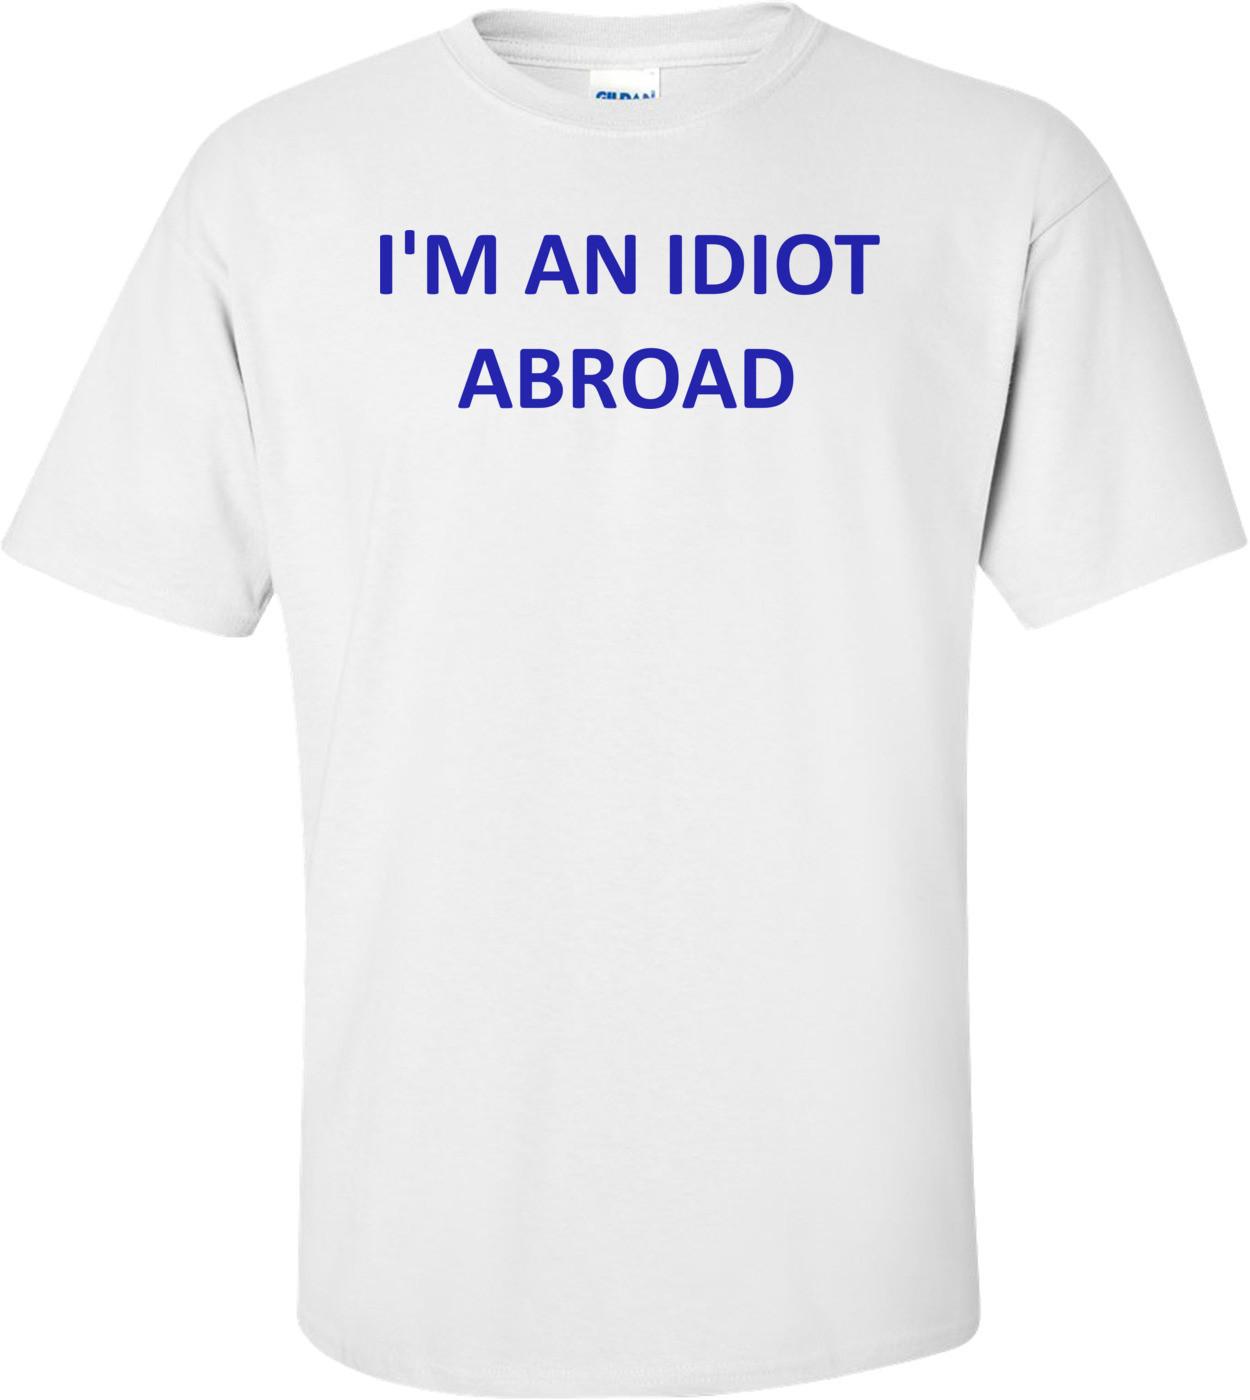 I'M AN IDIOT ABROAD Shirt